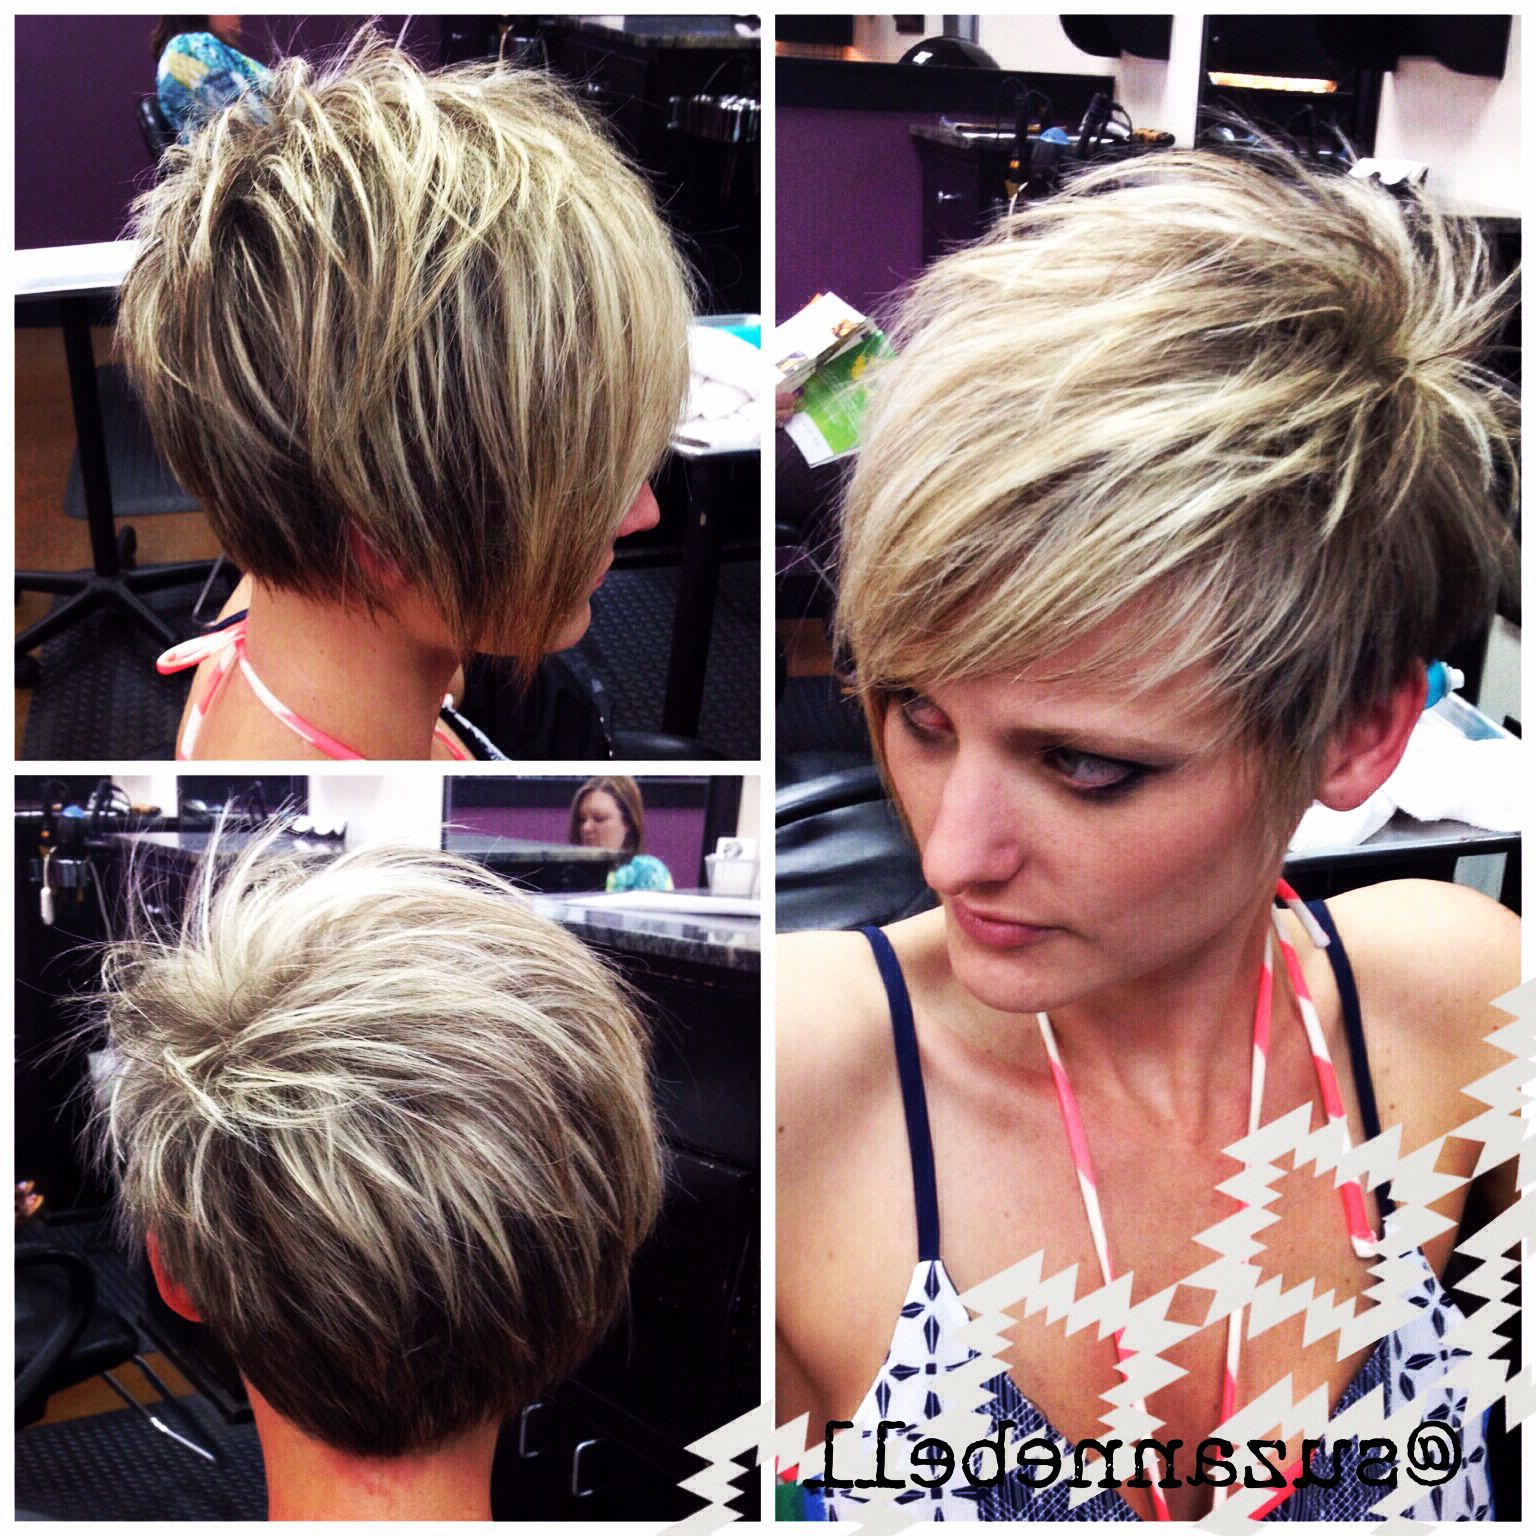 Asymmetrical Pixie | Hair Inspiration | Pinterest | Hair, Hair Throughout Sassy Pixie Hairstyles (View 14 of 20)